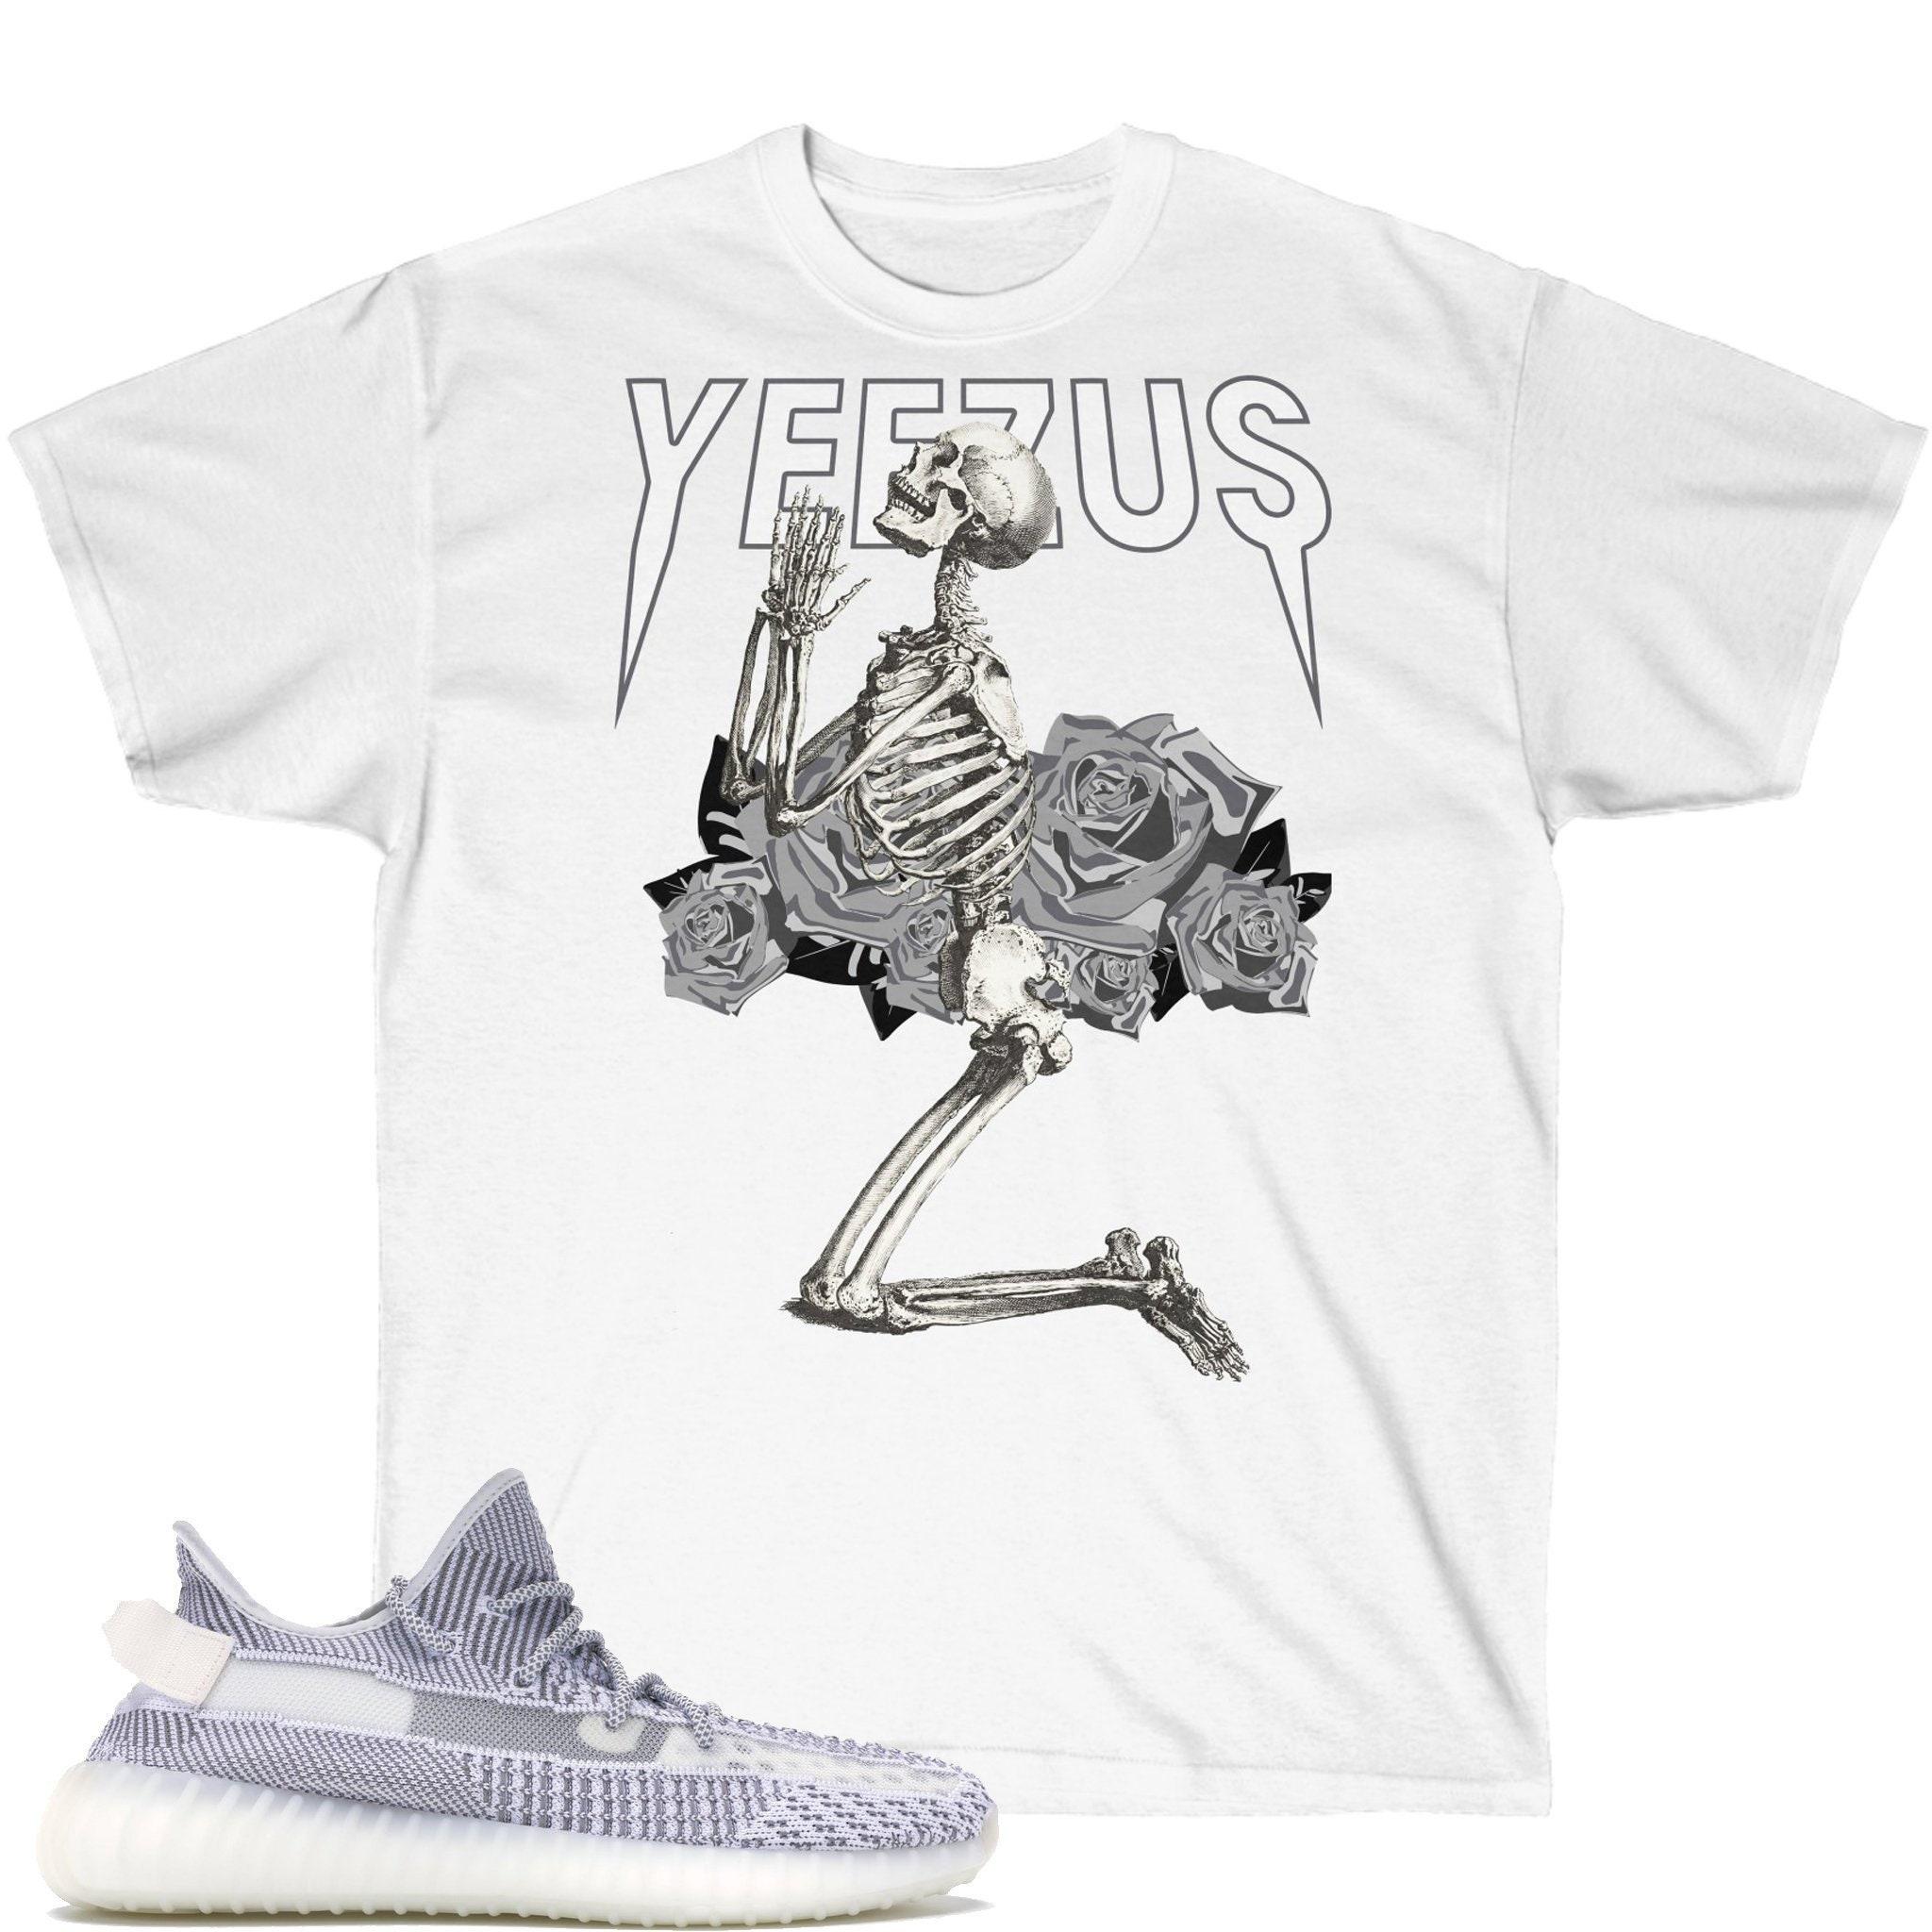 2e672965ff9d9 Yeezy Boost 350 V2 Static T-Shirt, Yeezy Boost Static Shirt, Yeezy Boost  T-Shirt, Static Shirt, Yeezus V2, Graphic Gildan T-Shirt